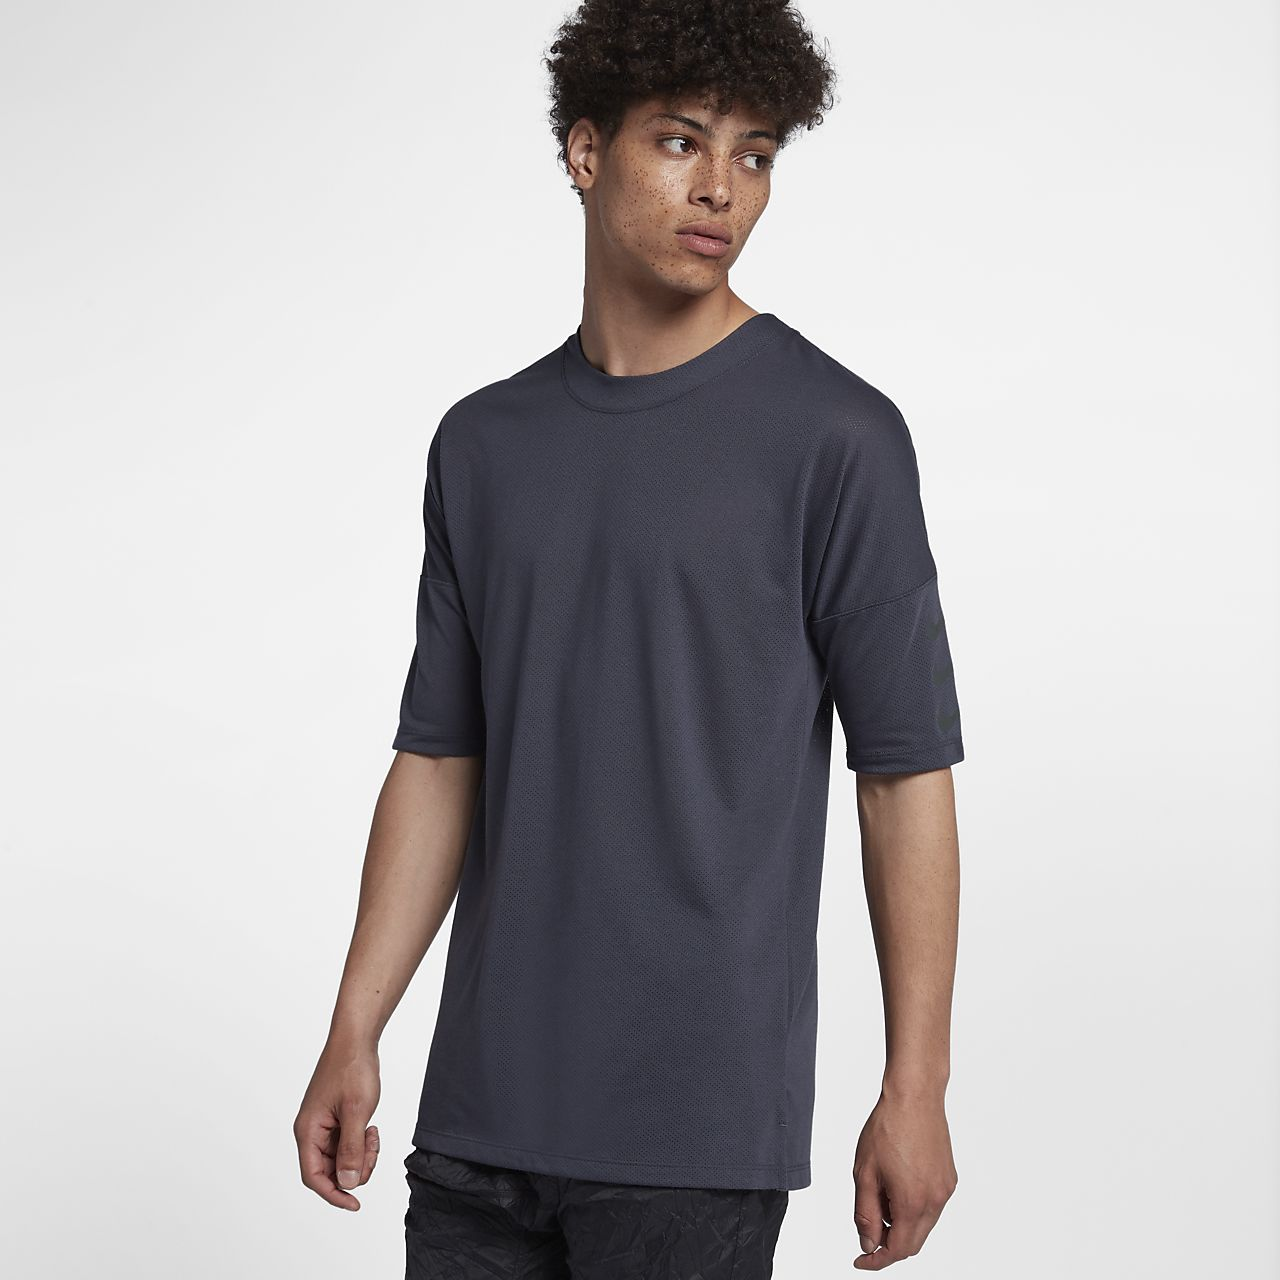 Nike Rise 365 Men's Half Sleeve Running Top